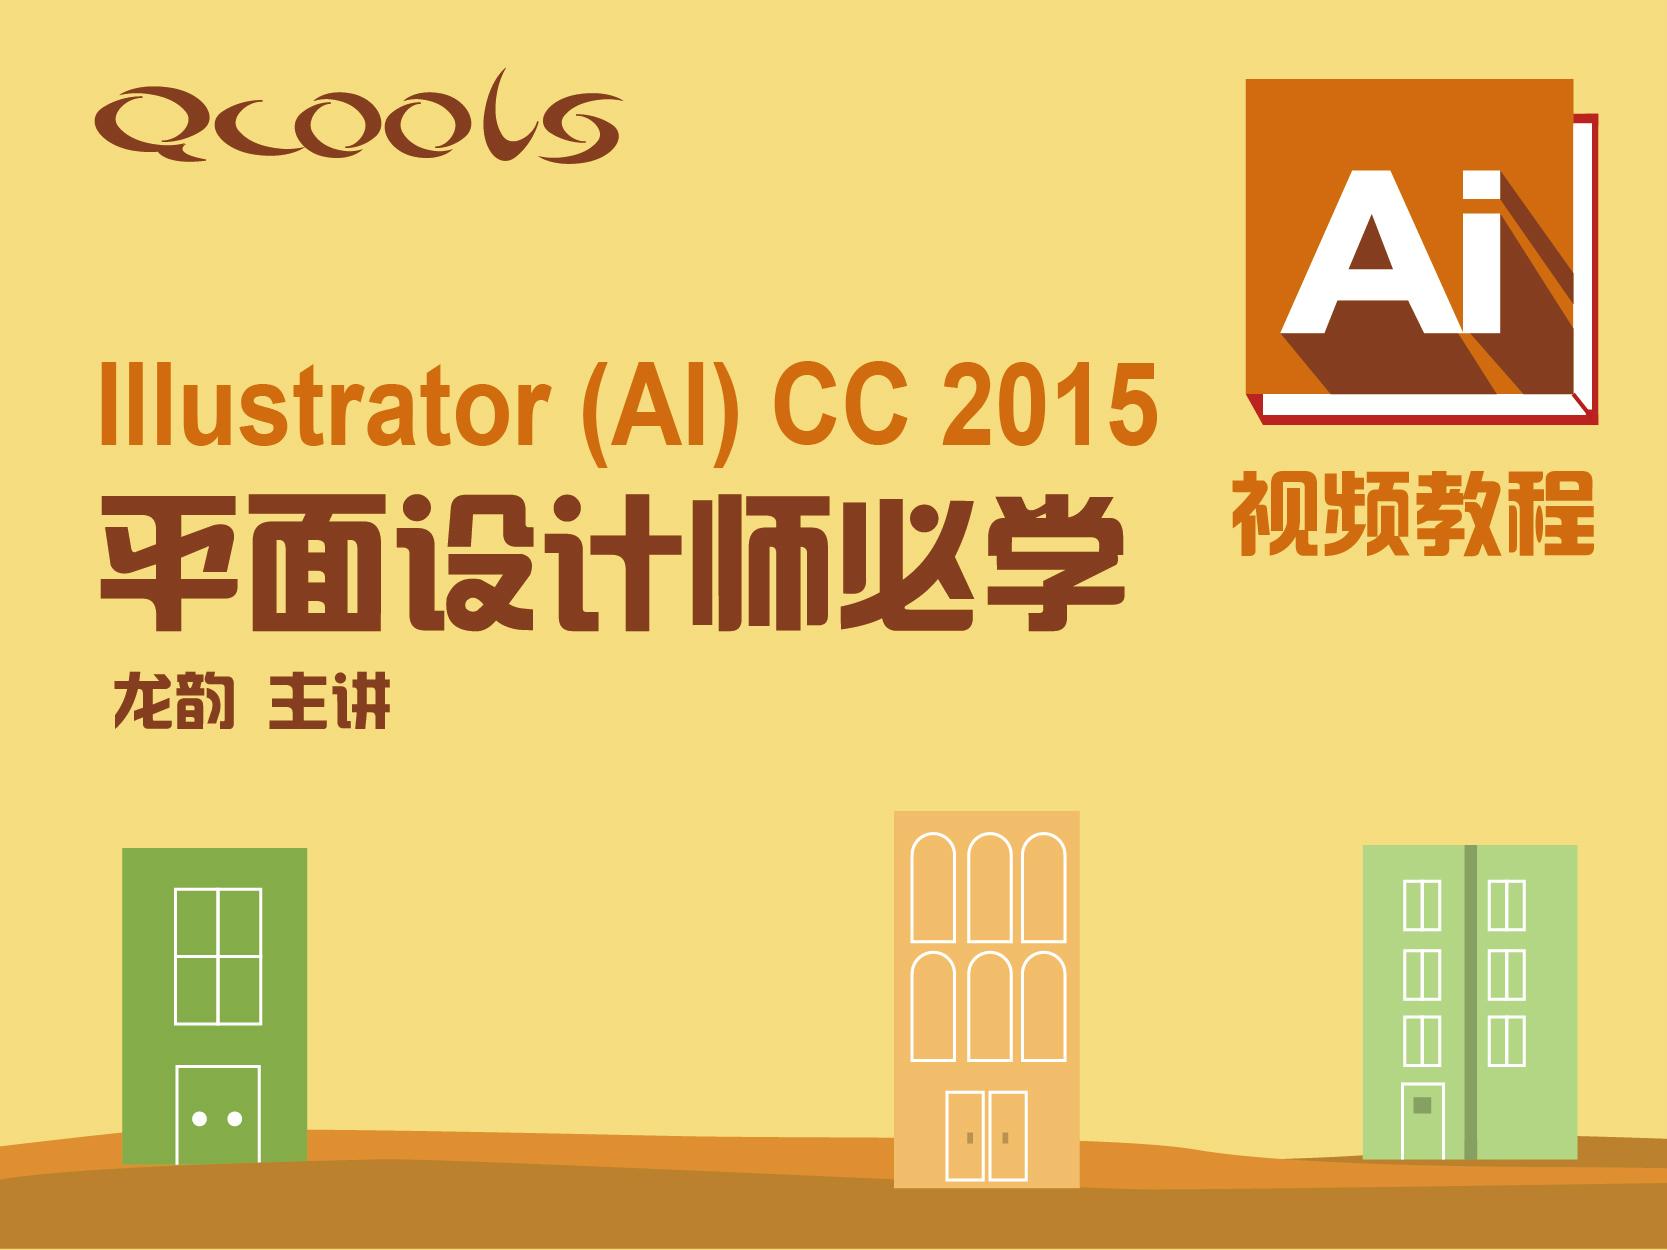 Illustrator CC 2015(AI)从入门到精通视频教程【第3章】